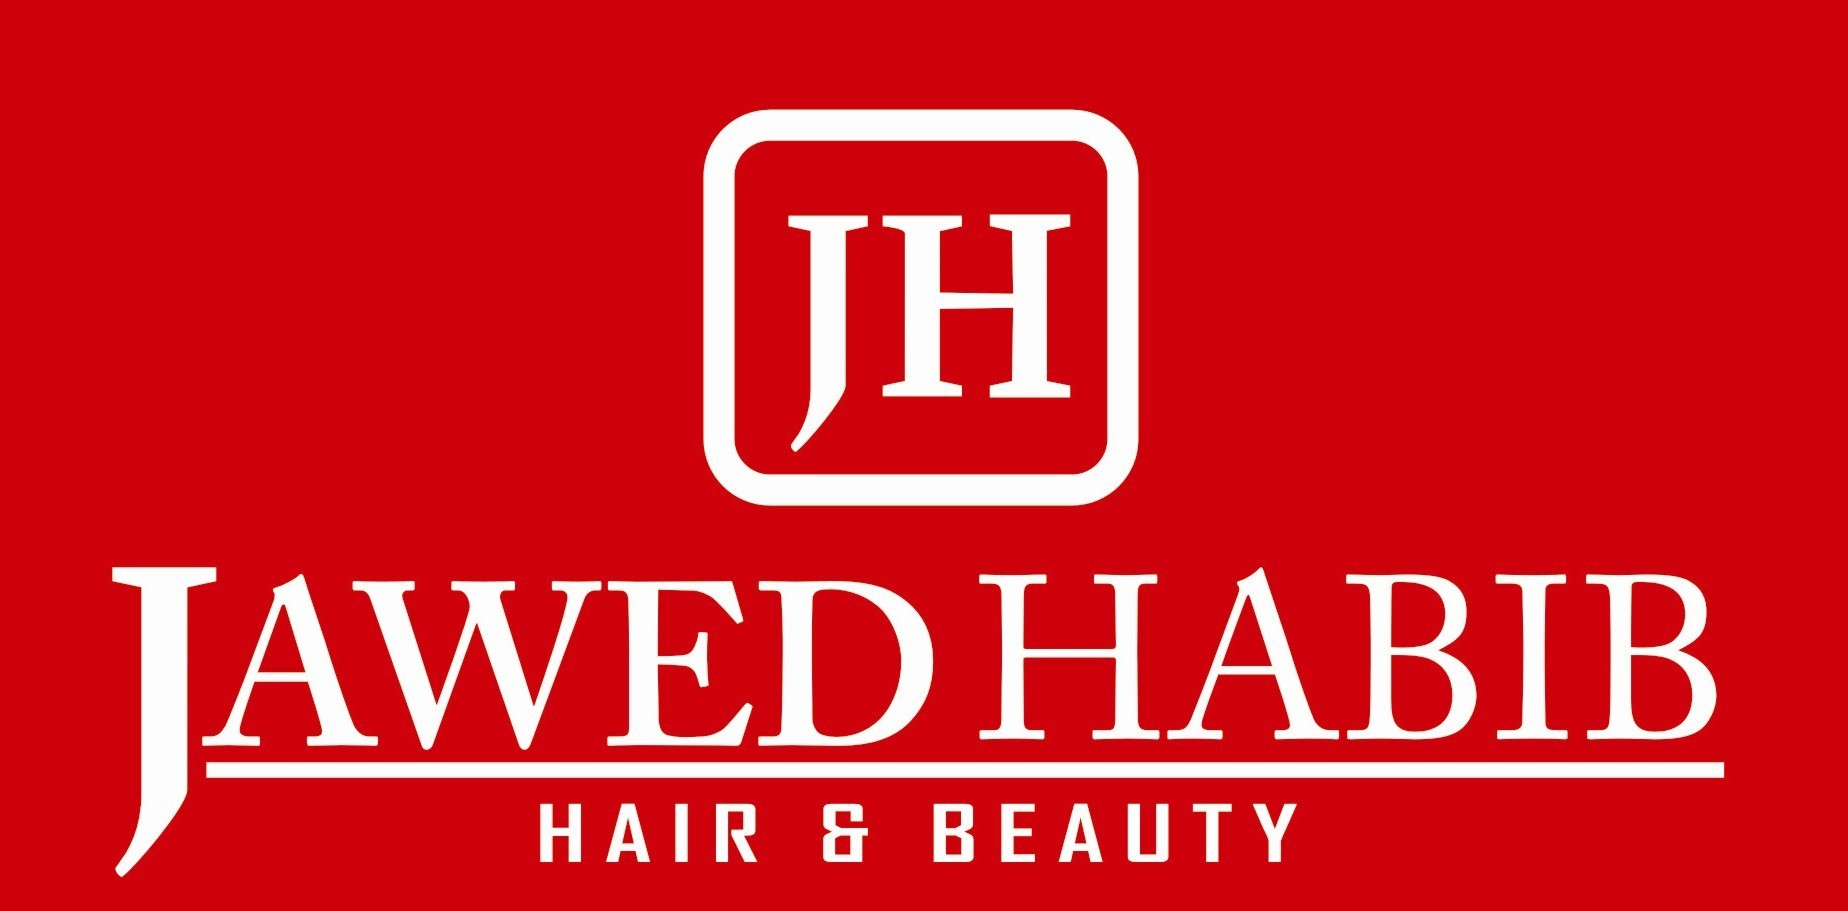 Jawed Habib Hair & Beauty Salons - K.B Road - Jorhat Image